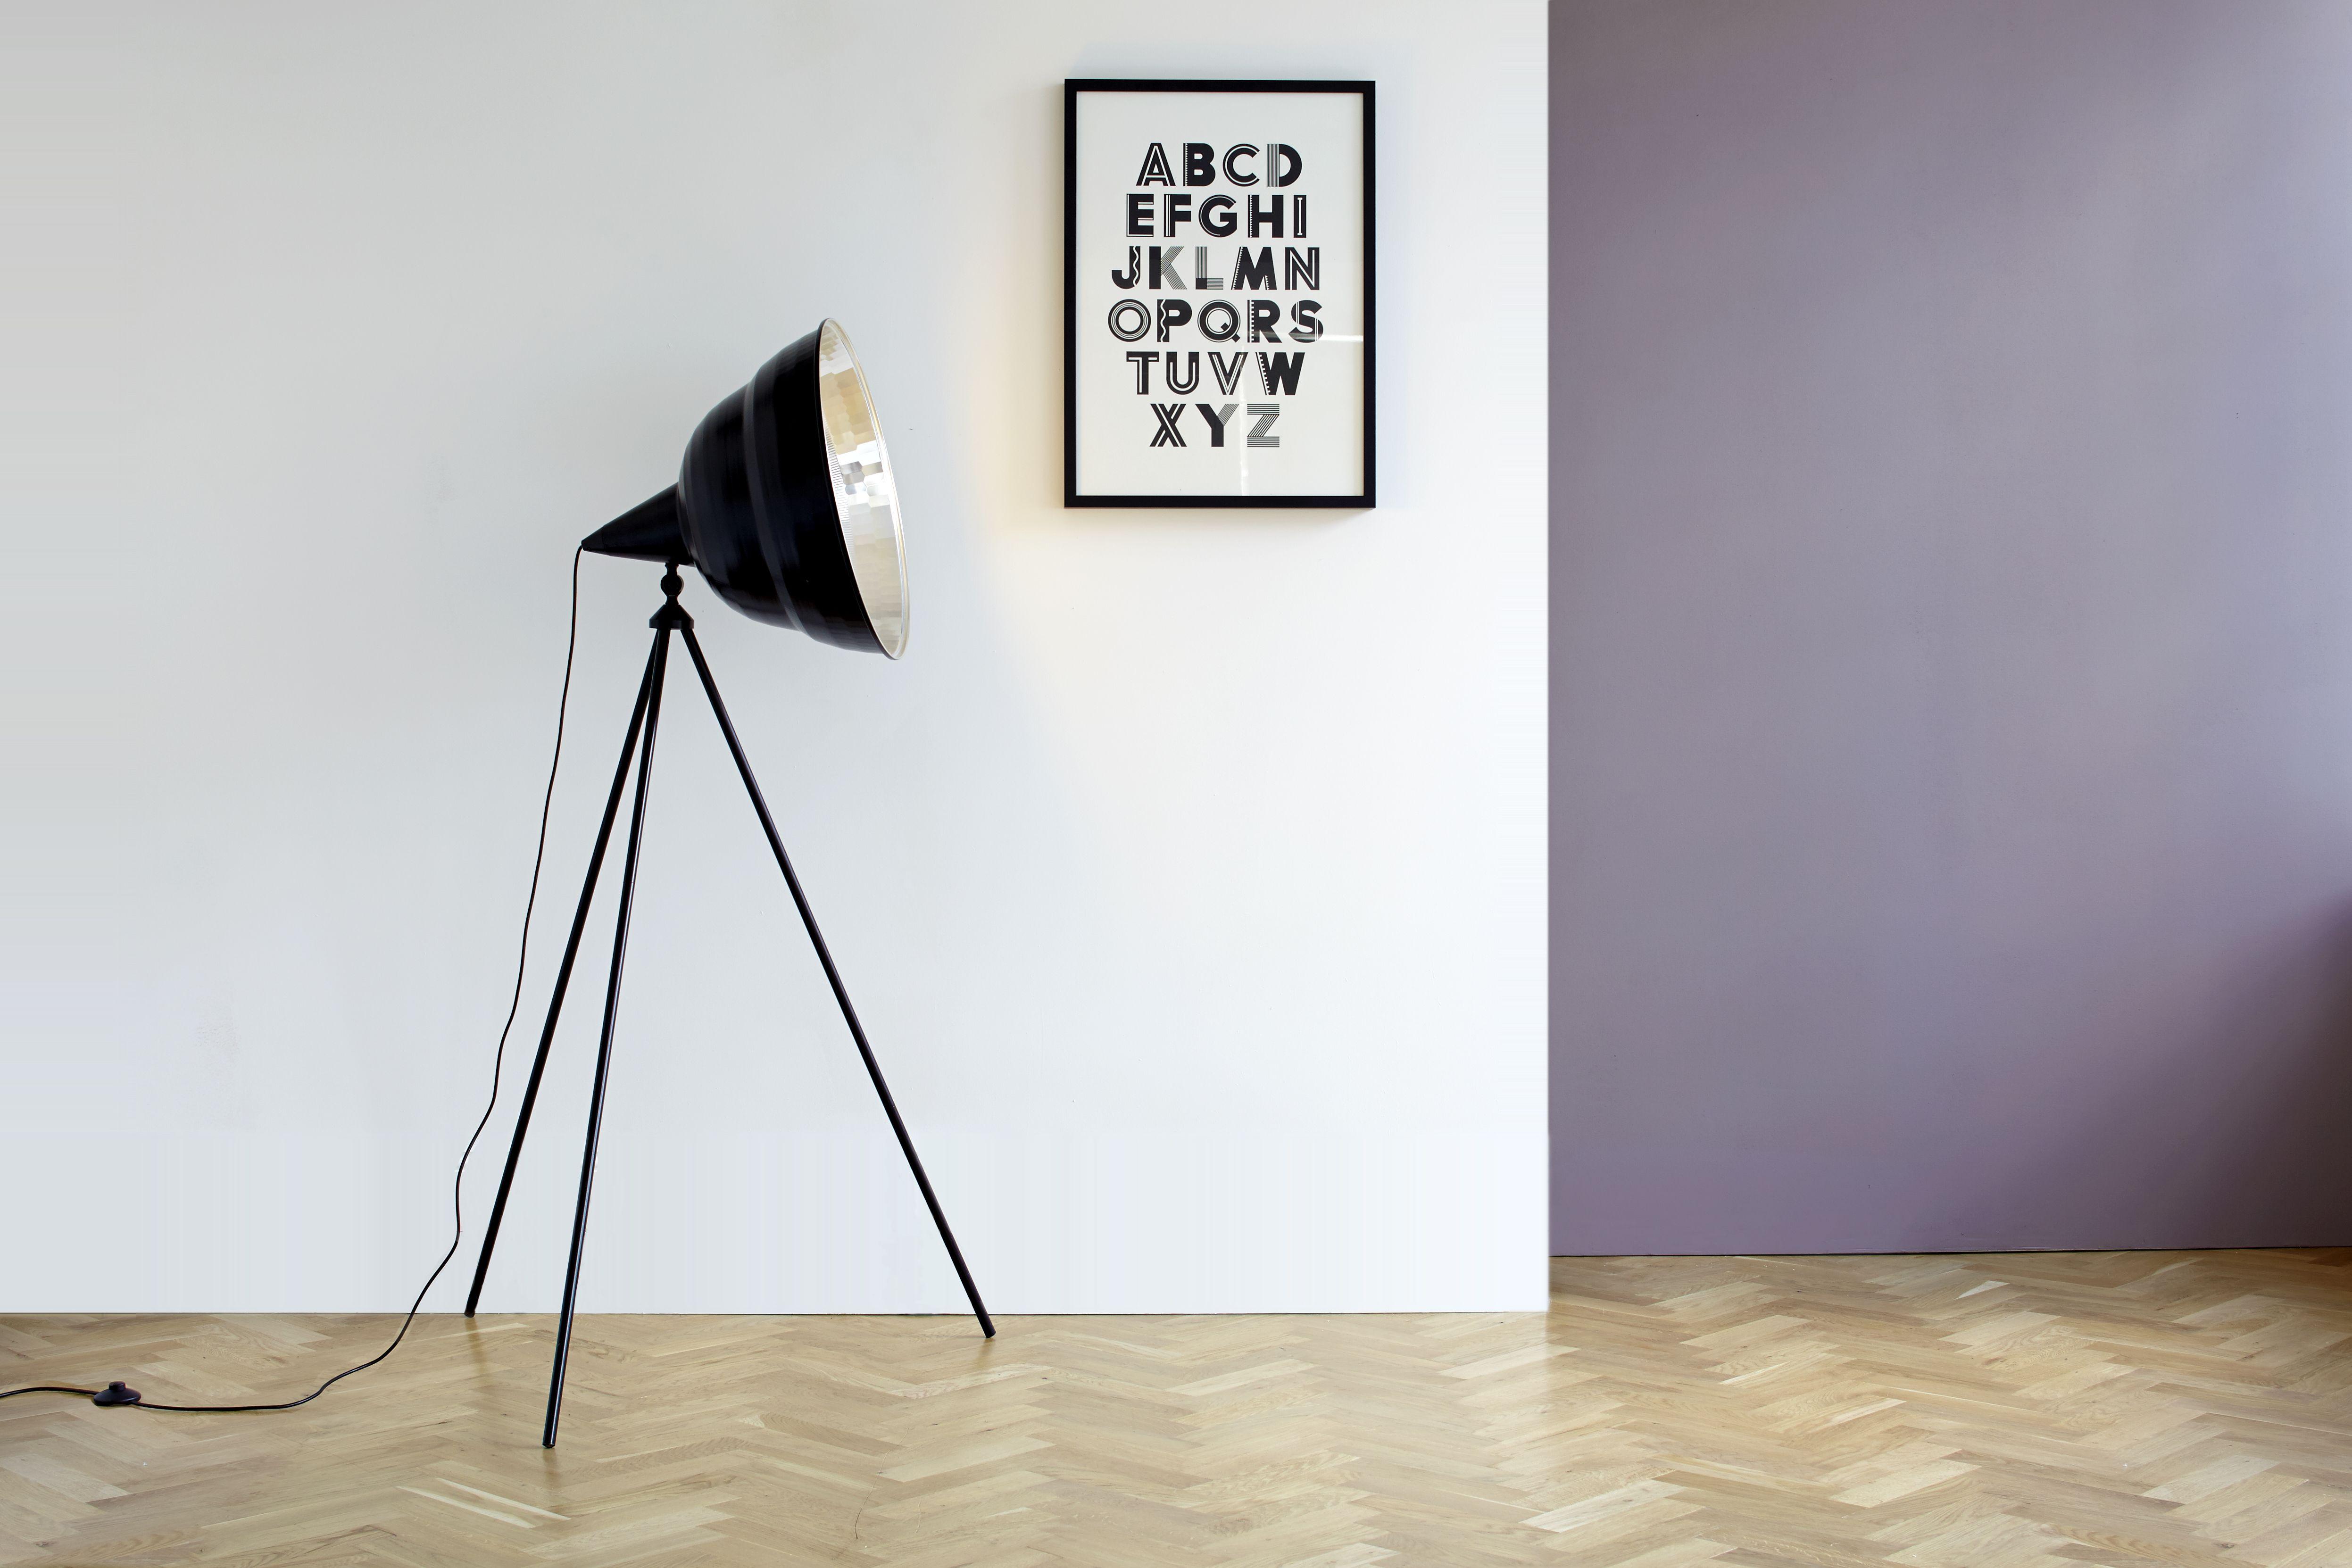 Giant Photographic Floor Lamp Inspired